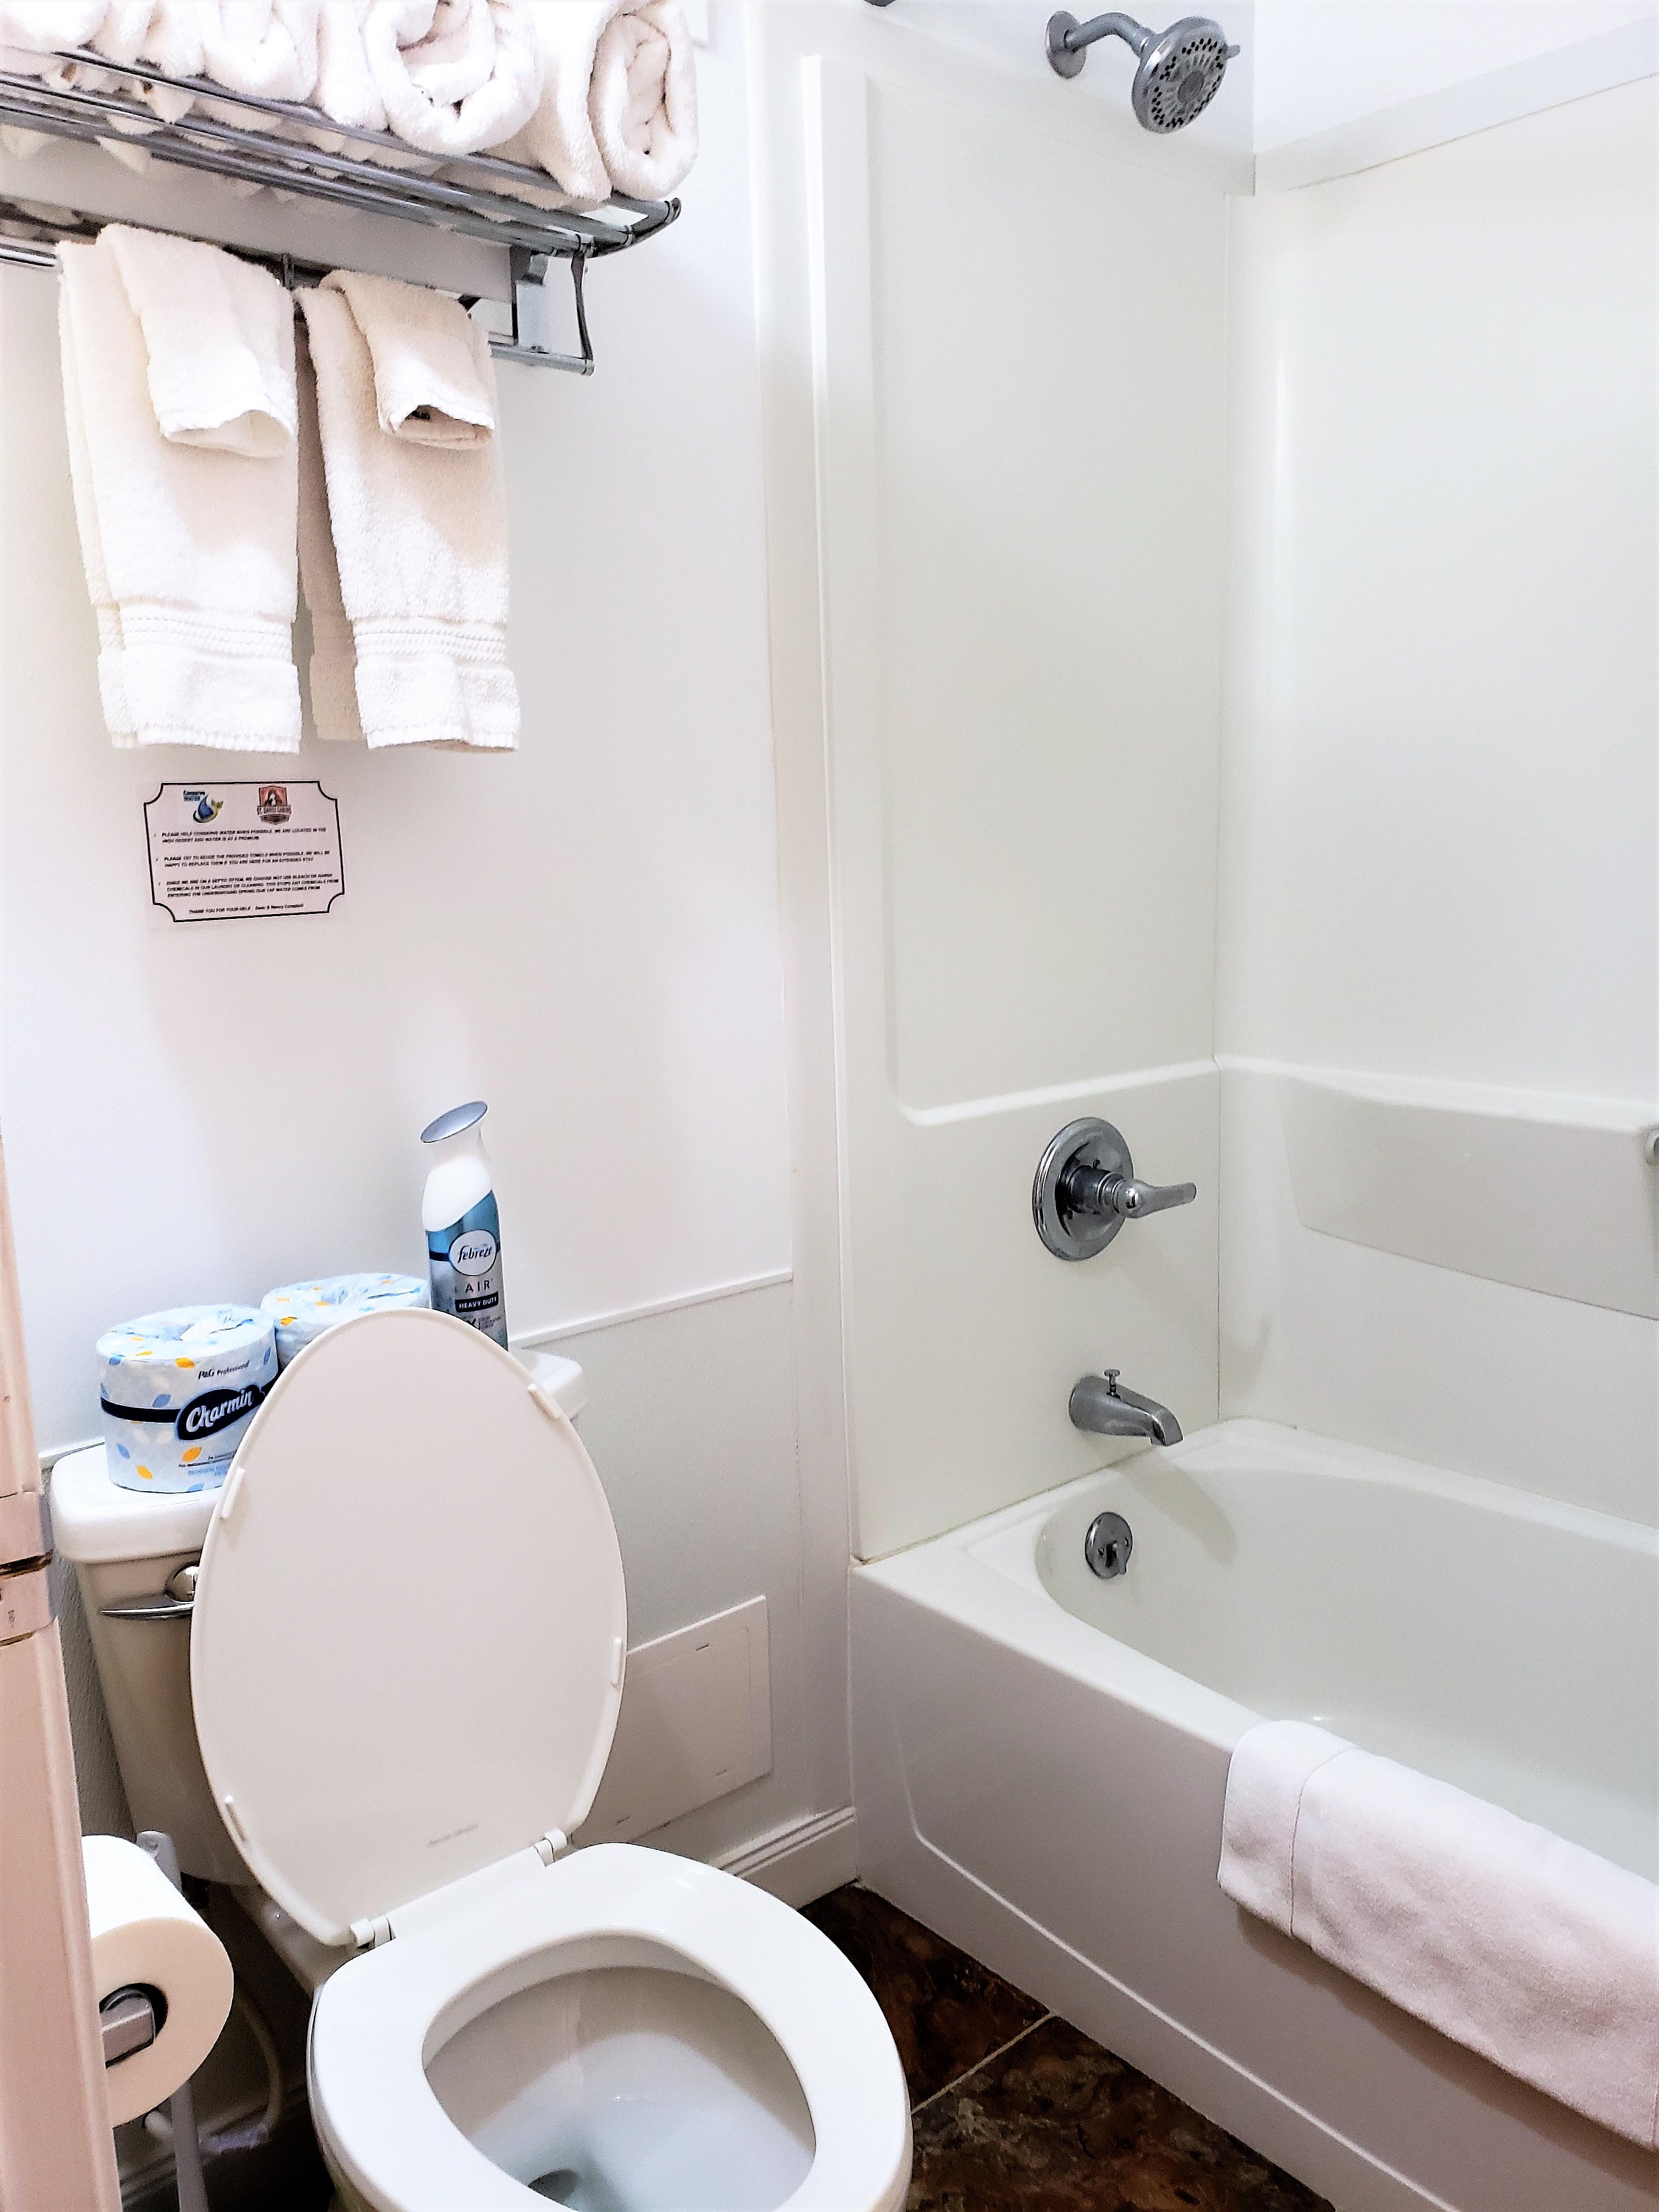 Prickly Pear Adobe Cabin bathroom with tub/shower